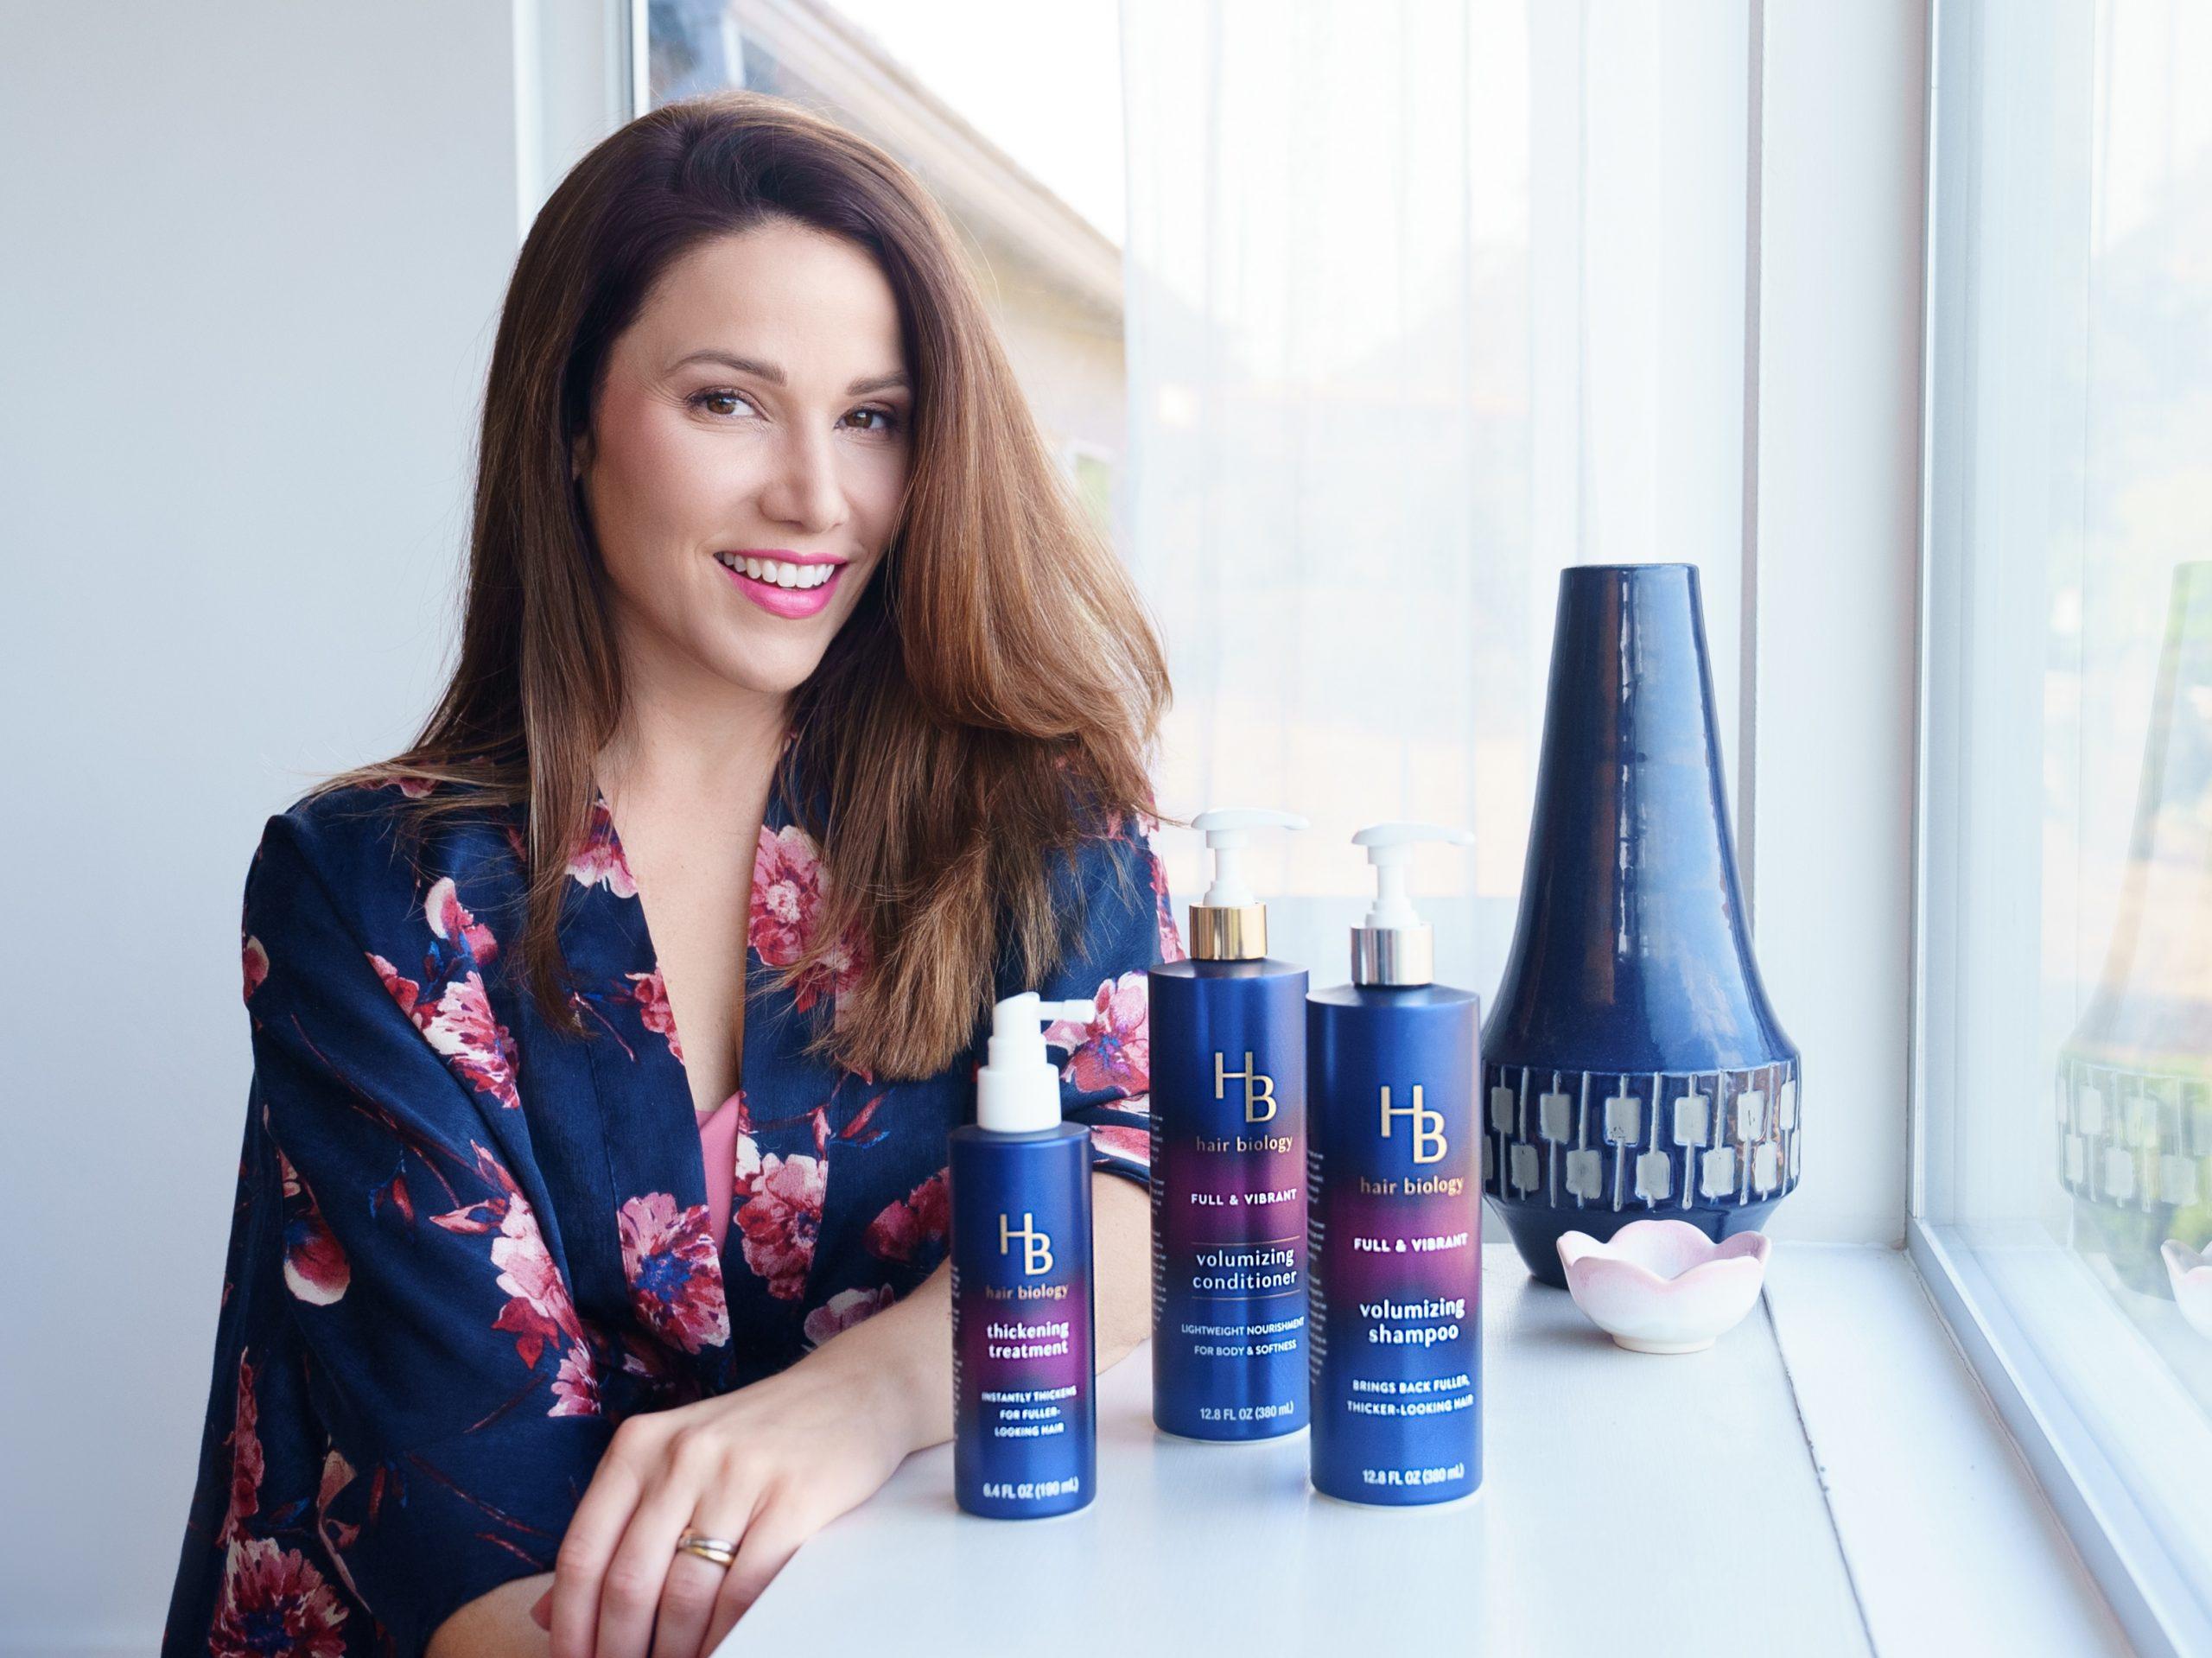 Why I LOVE Hair Biology's Hair Thickening Treatment